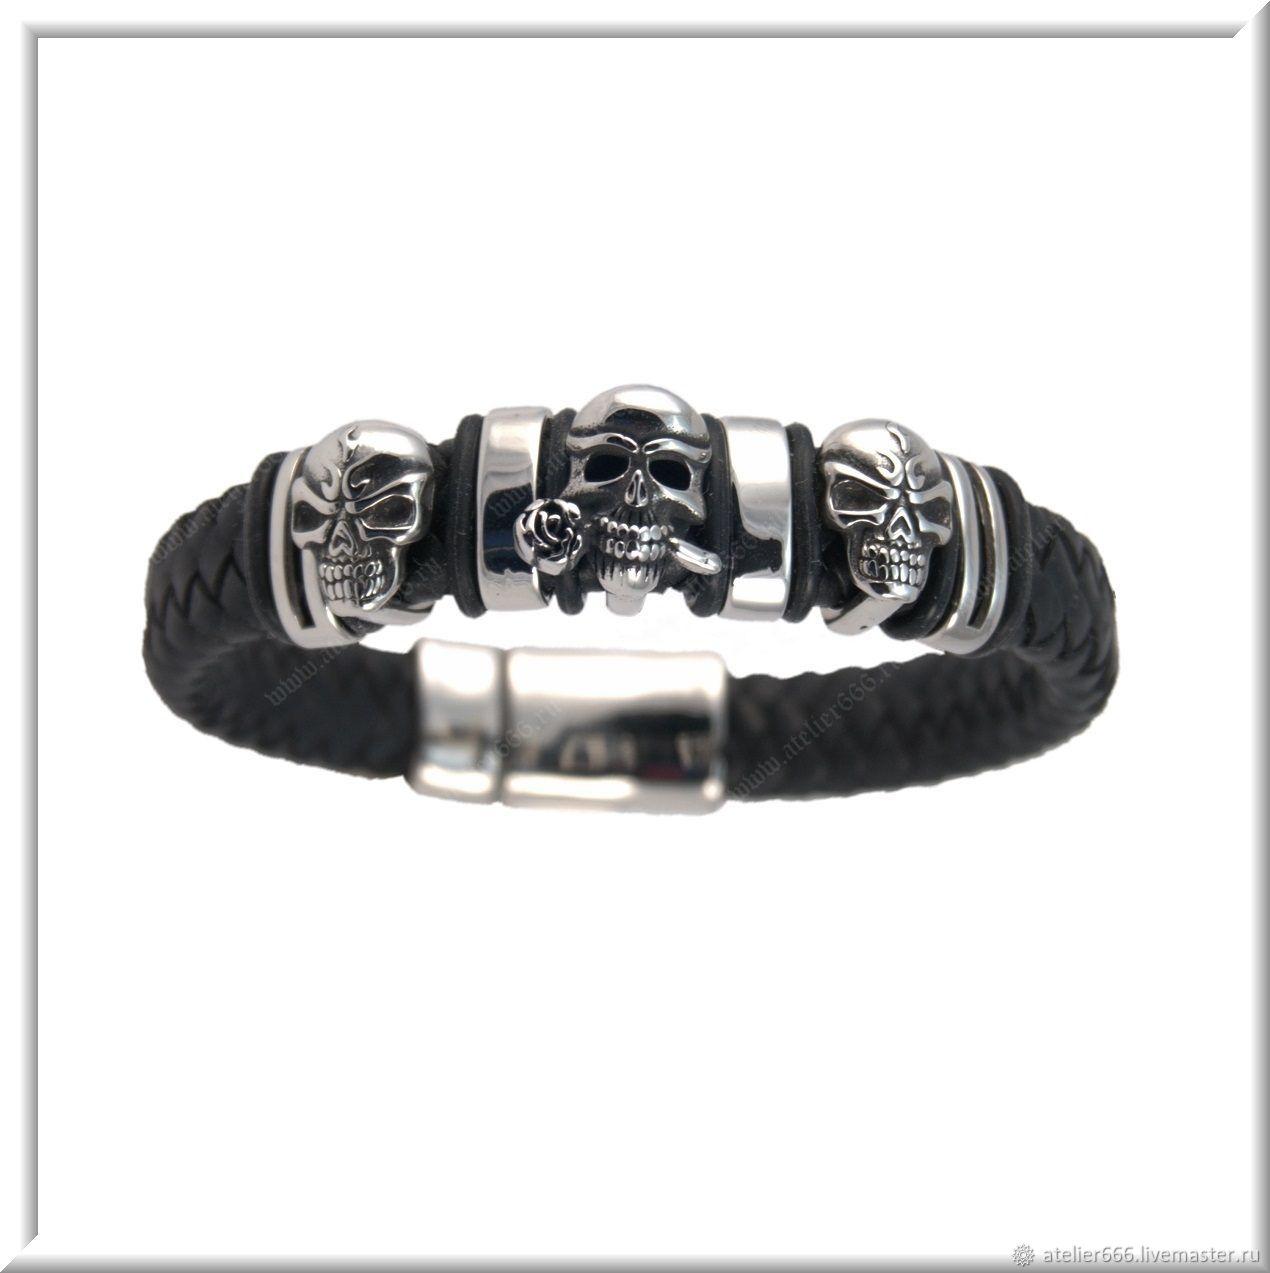 Women's leather bracelet No. 4 accessories steel 316L, Regaliz bracelet, Moscow,  Фото №1